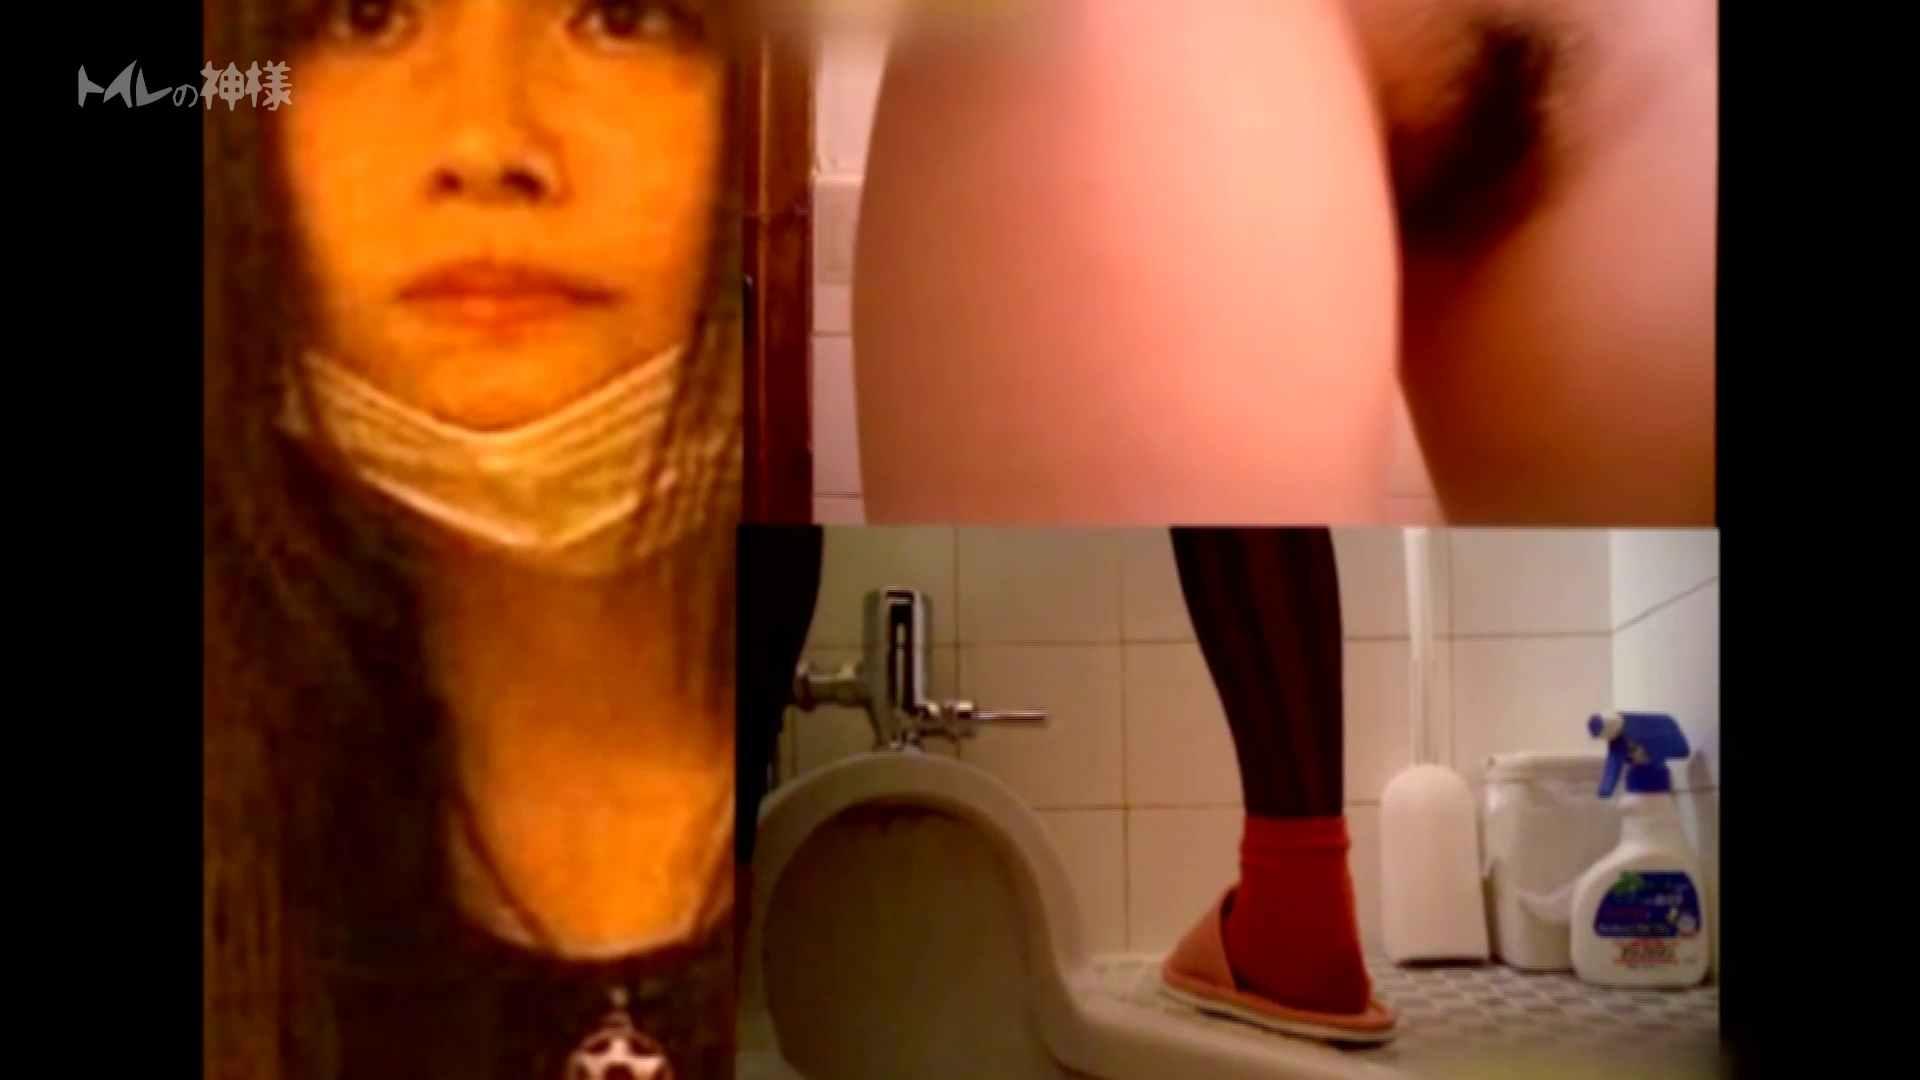 Vol.02 花の女子大生うんこ盗撮2 トイレ中 | 盗撮エロすぎ  34連発 3